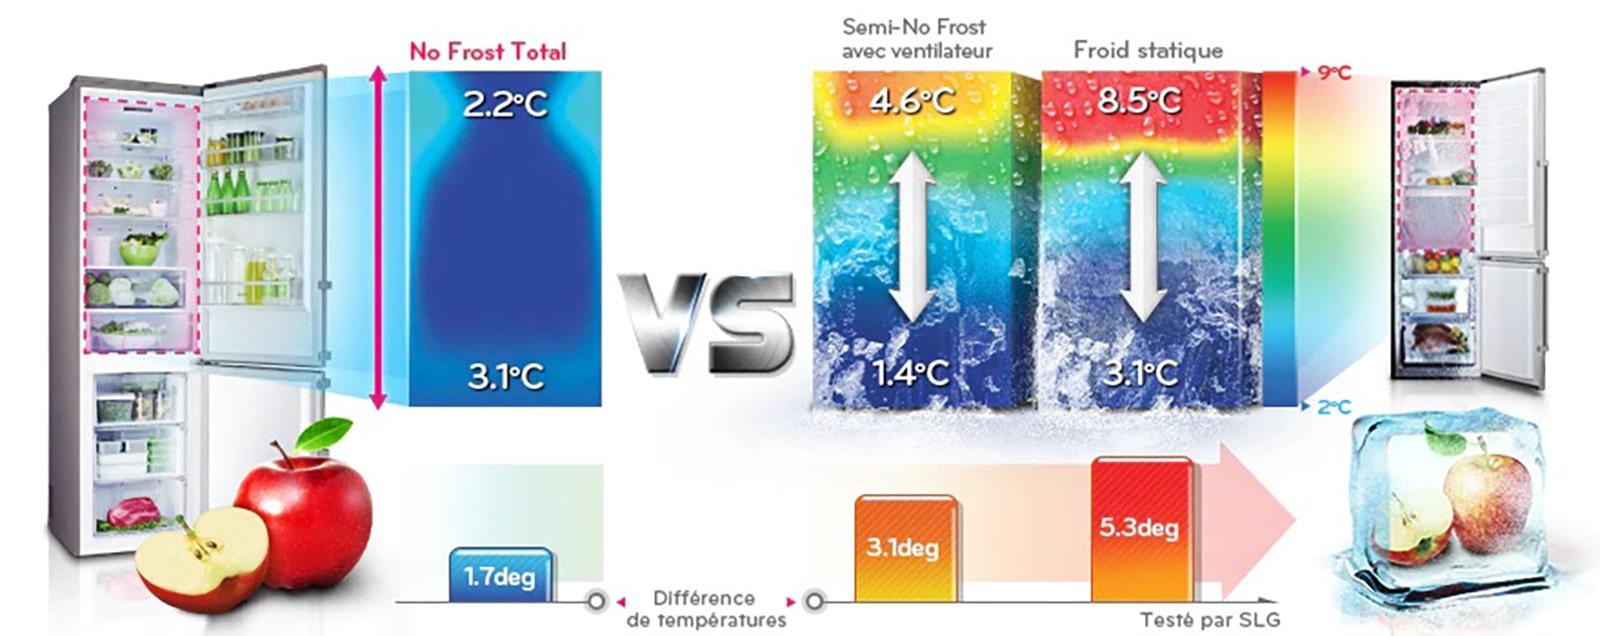 FROID VENTILÉ TOTAL ( No Frost Total )